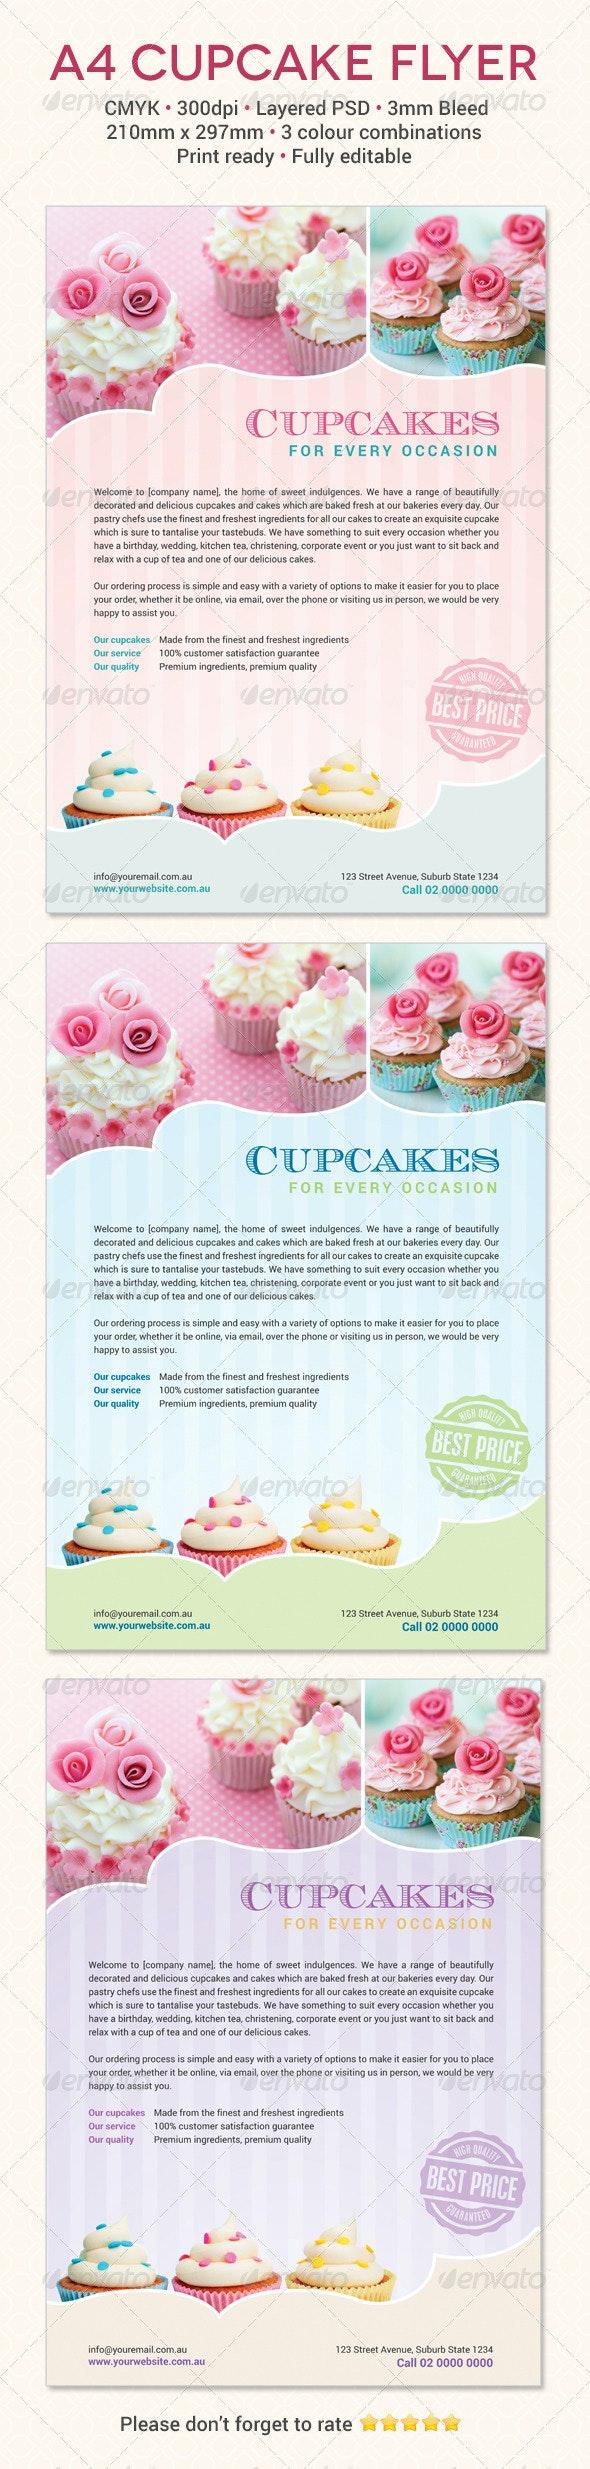 Cupcake Flyer Template - Flyers Print Templates